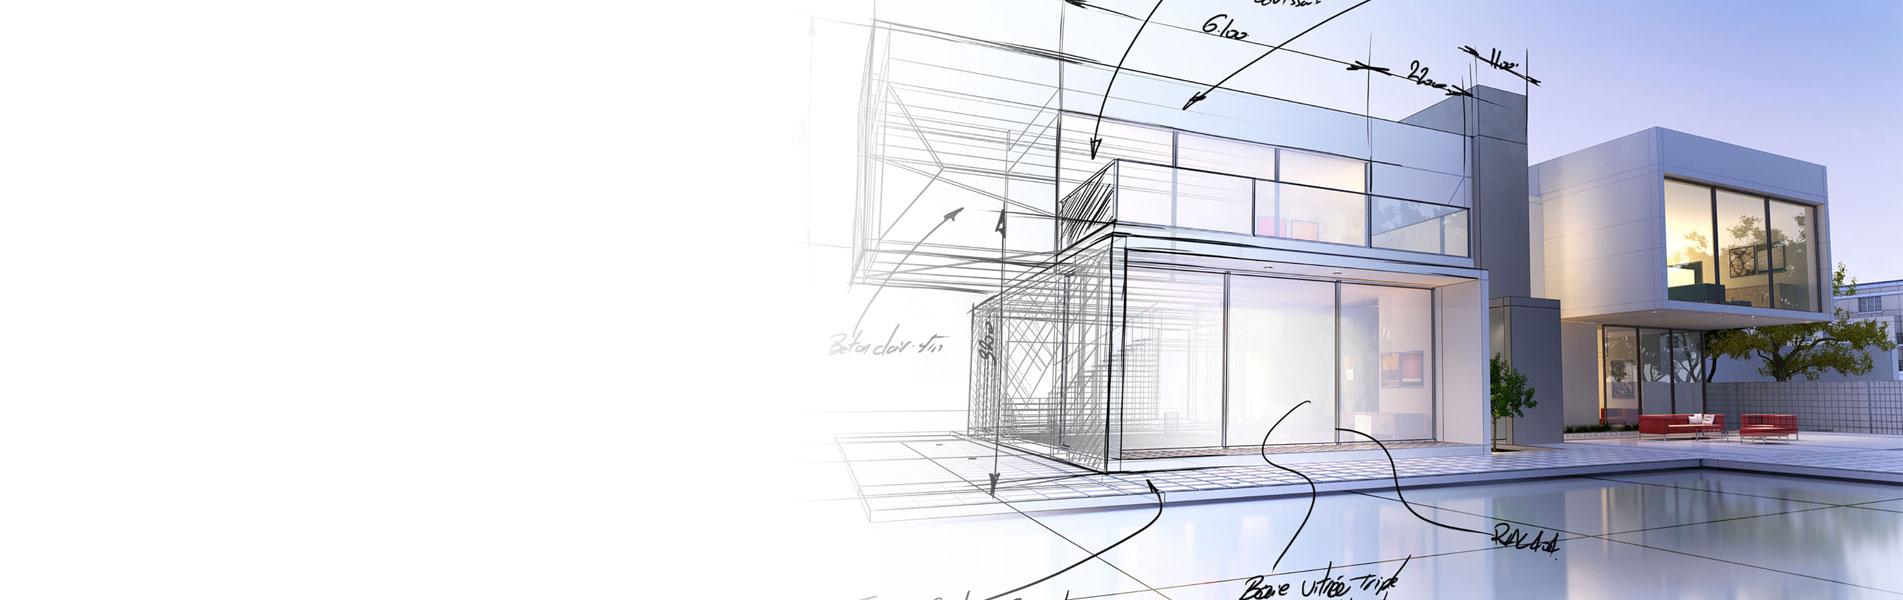 plan maison moderne individuelle perpignan